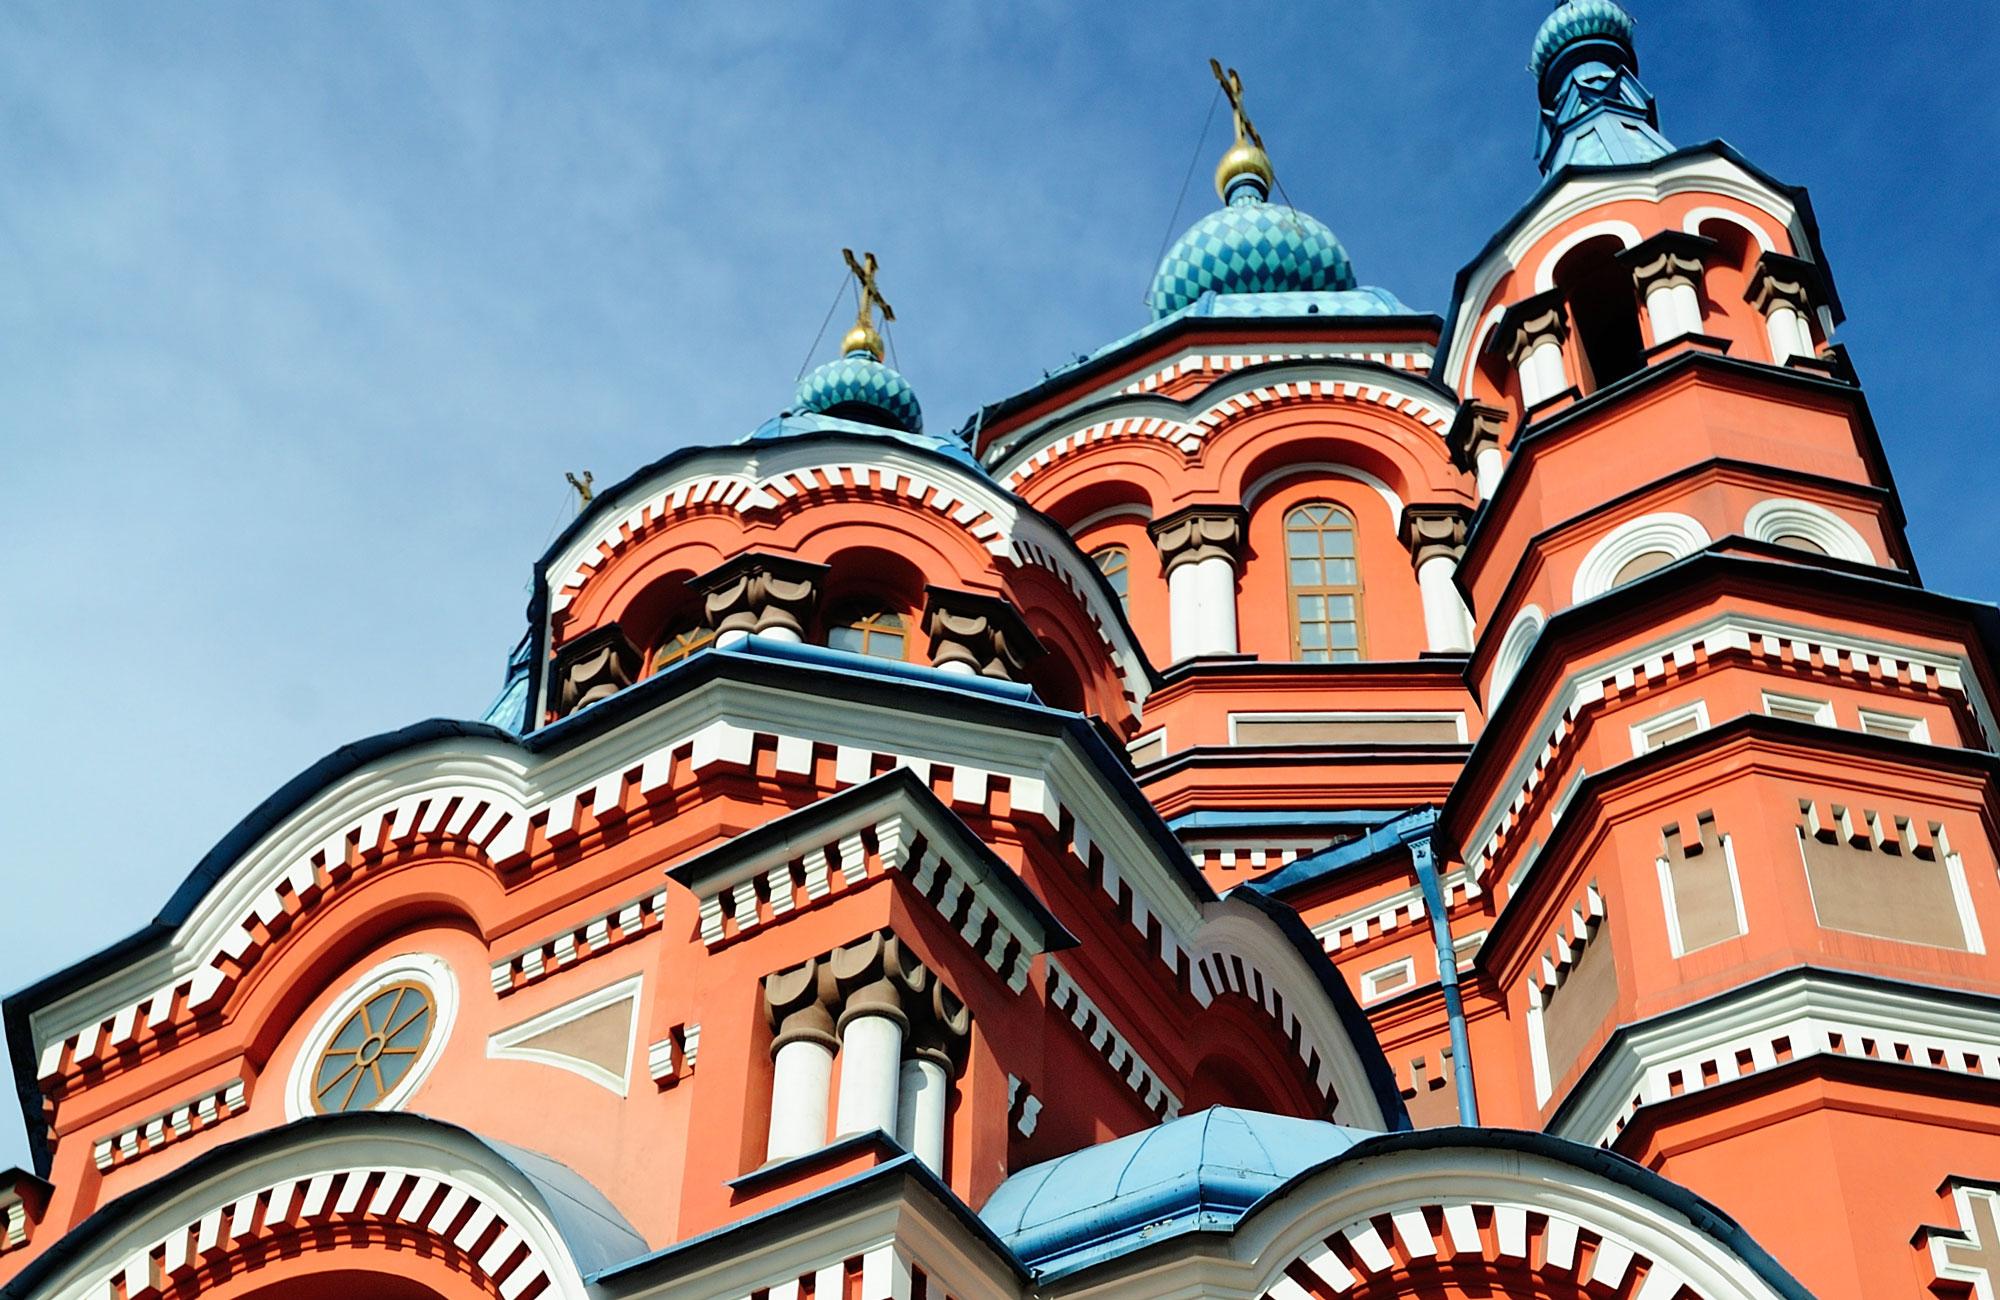 Voyage Russie - Cathédrale Notre-Dame-de-Kazan Irkoutsk - Amplitudes